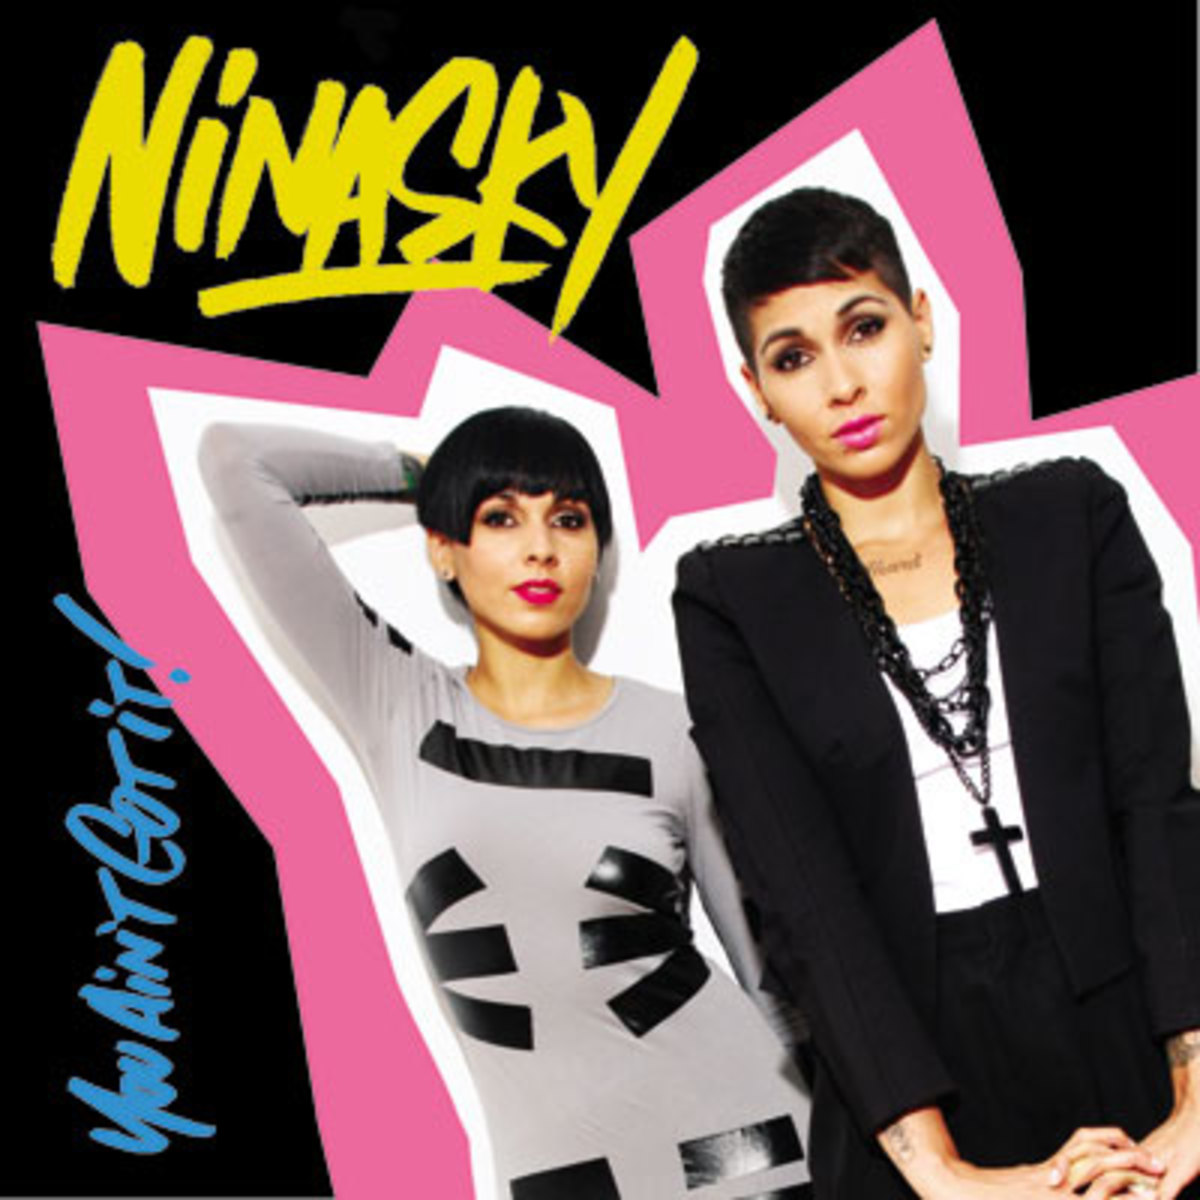 ninasky-youaintgotit.jpg